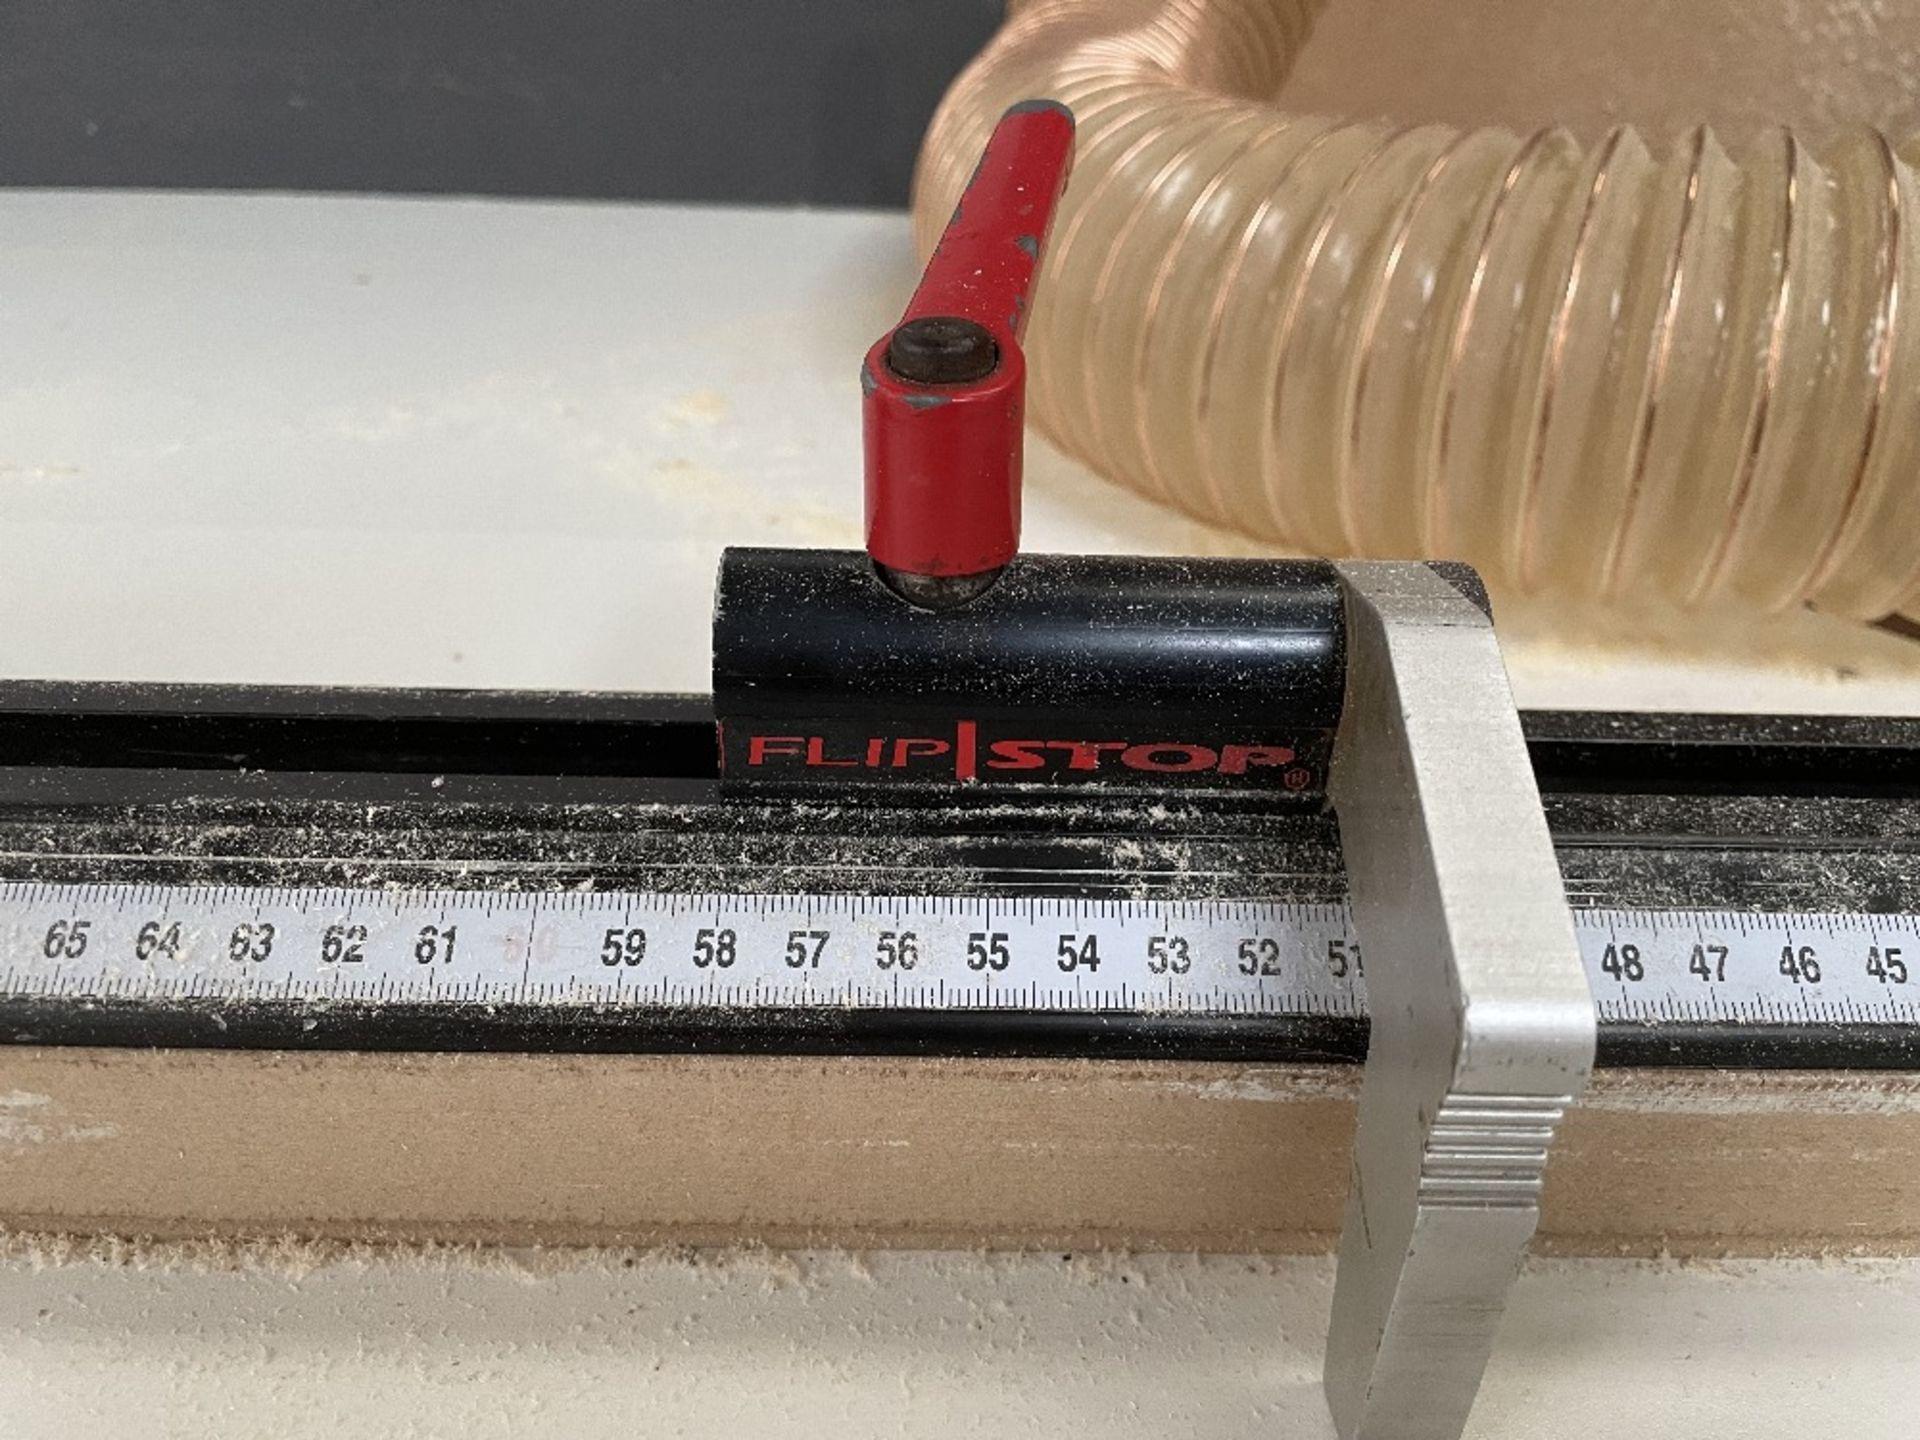 Makita LS1214 Corded 305mm Slide Compound Mitre Saw   110v - Image 5 of 6